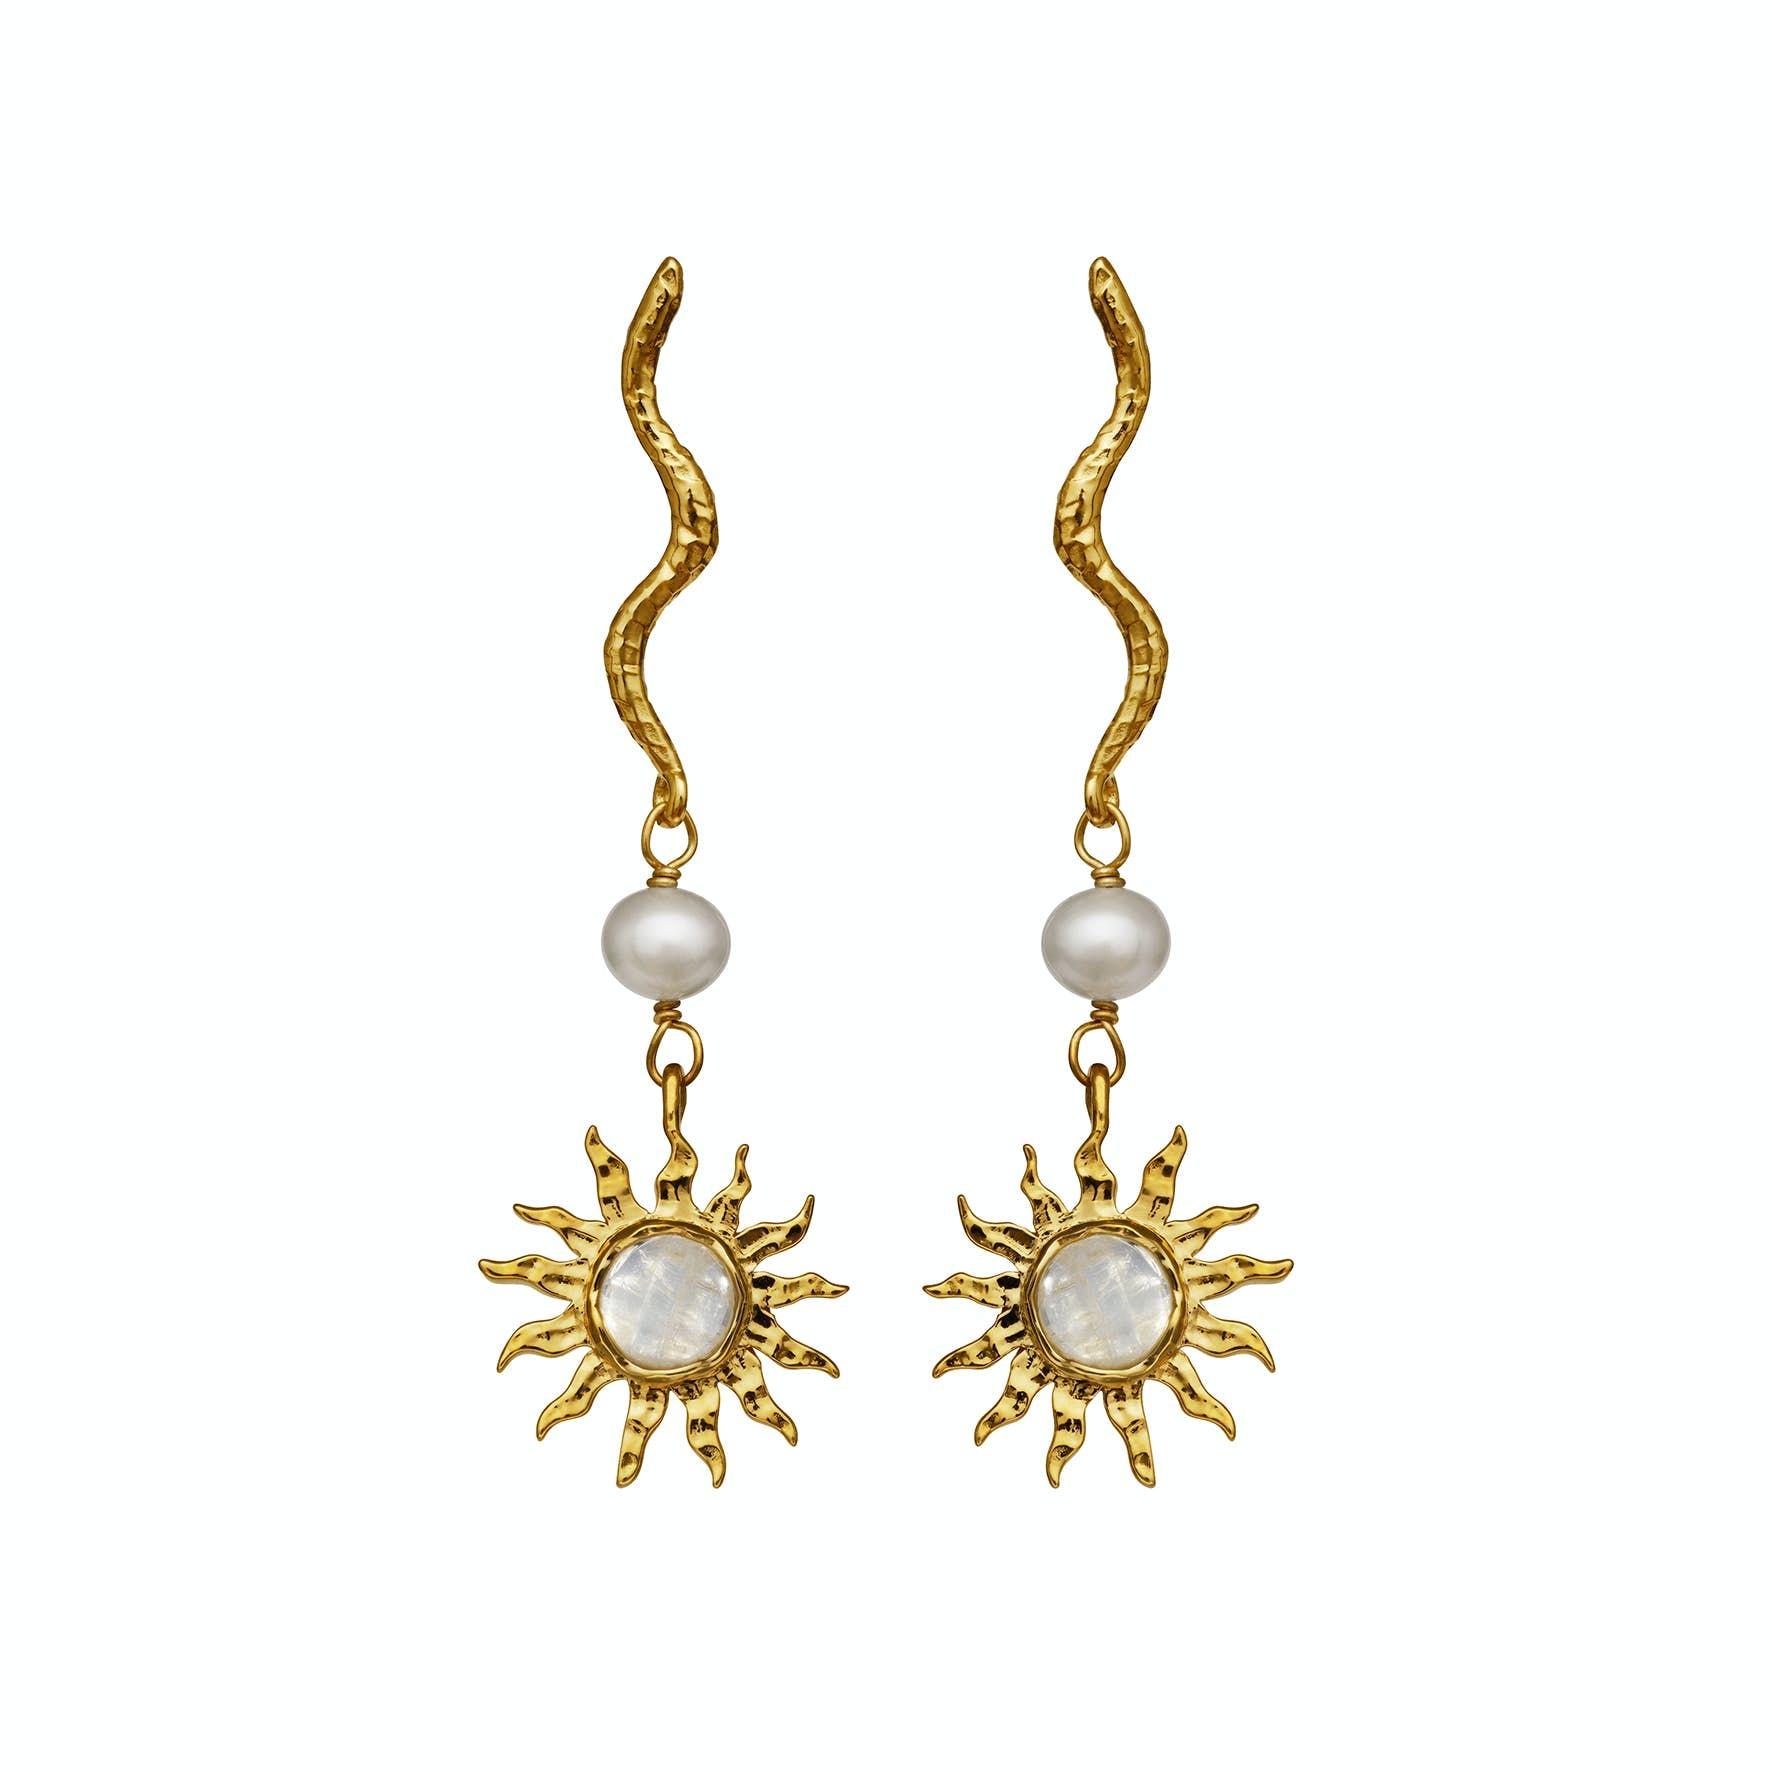 Dawn Earrings von Maanesten in Vergoldet-Silber Sterling 925